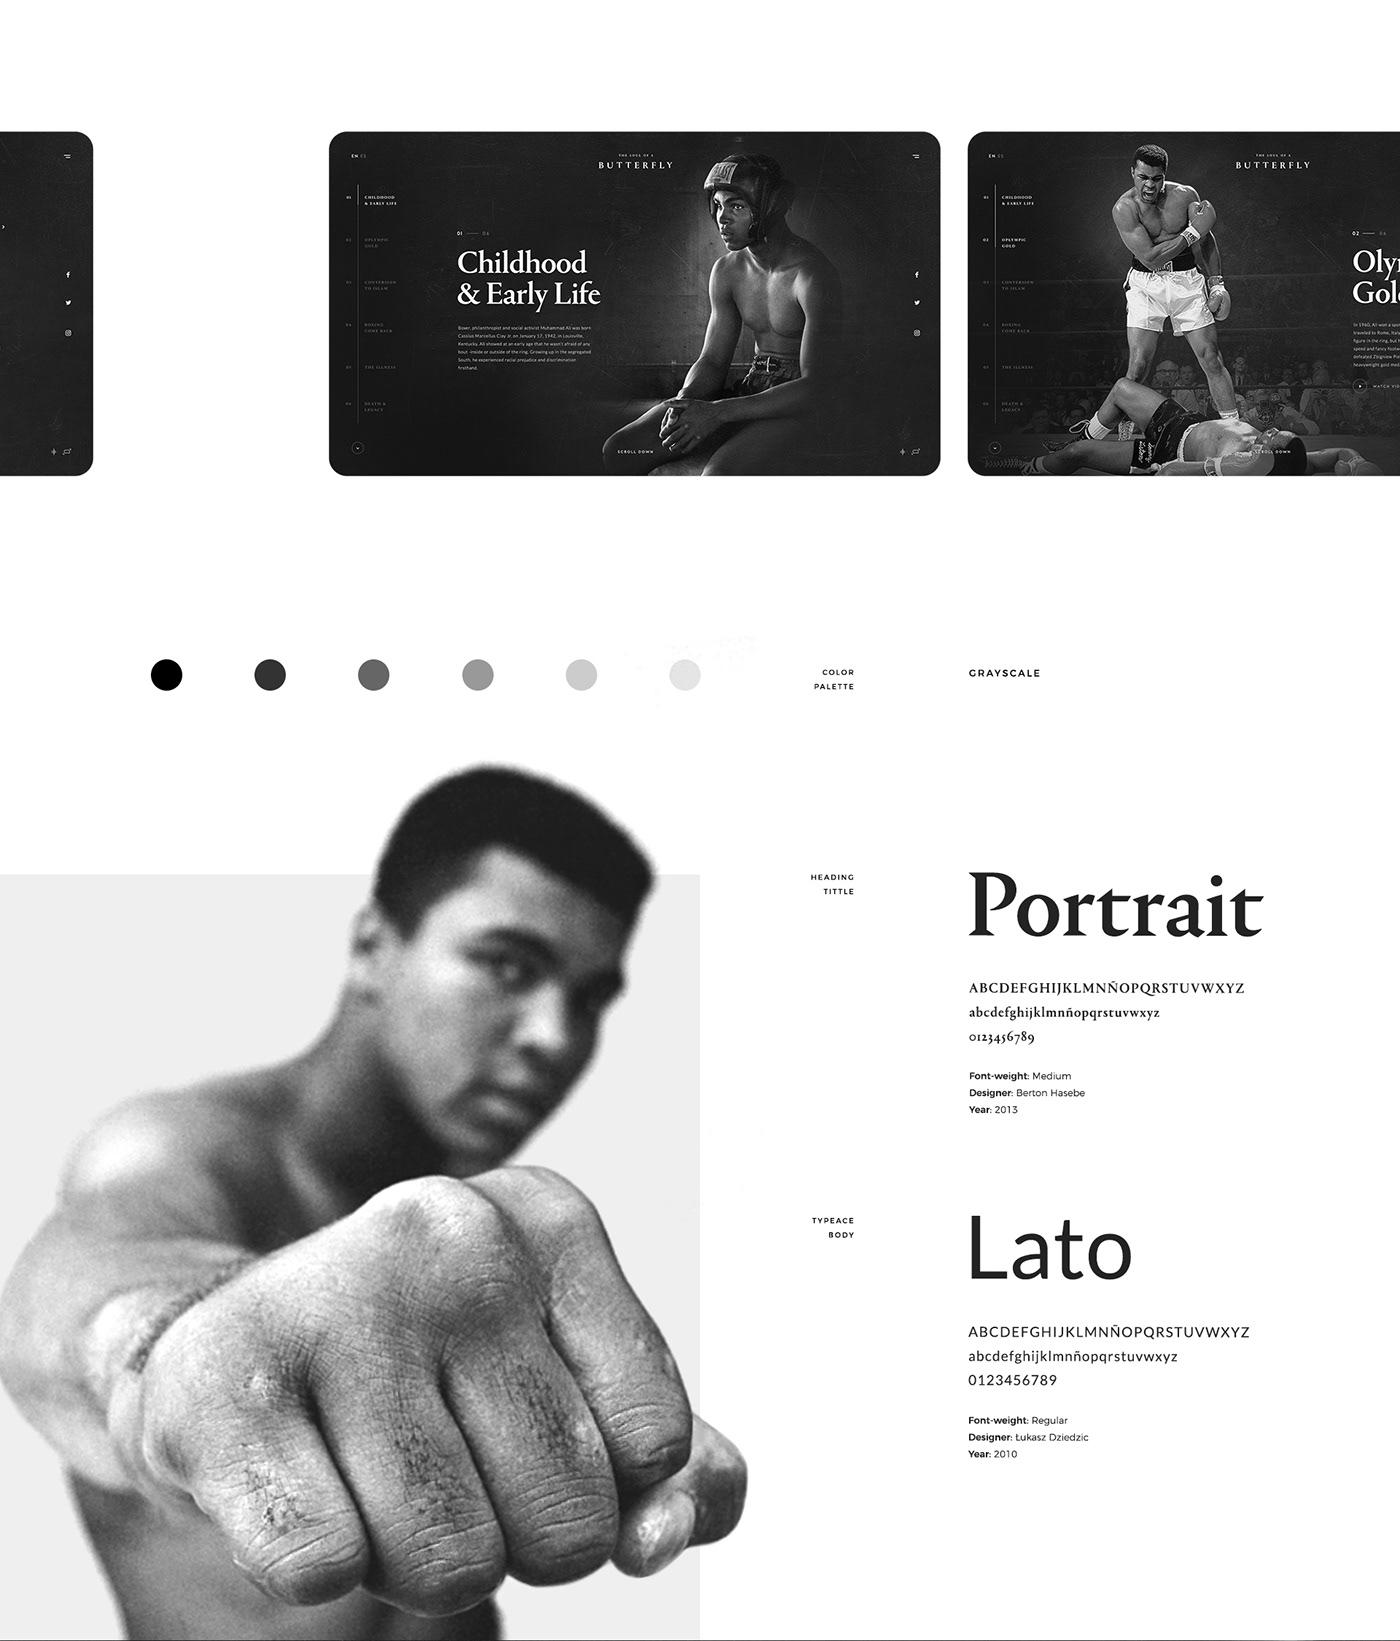 muhammad ali sport art direction  Website interaction Web black white UI/UX Web Design  design concept